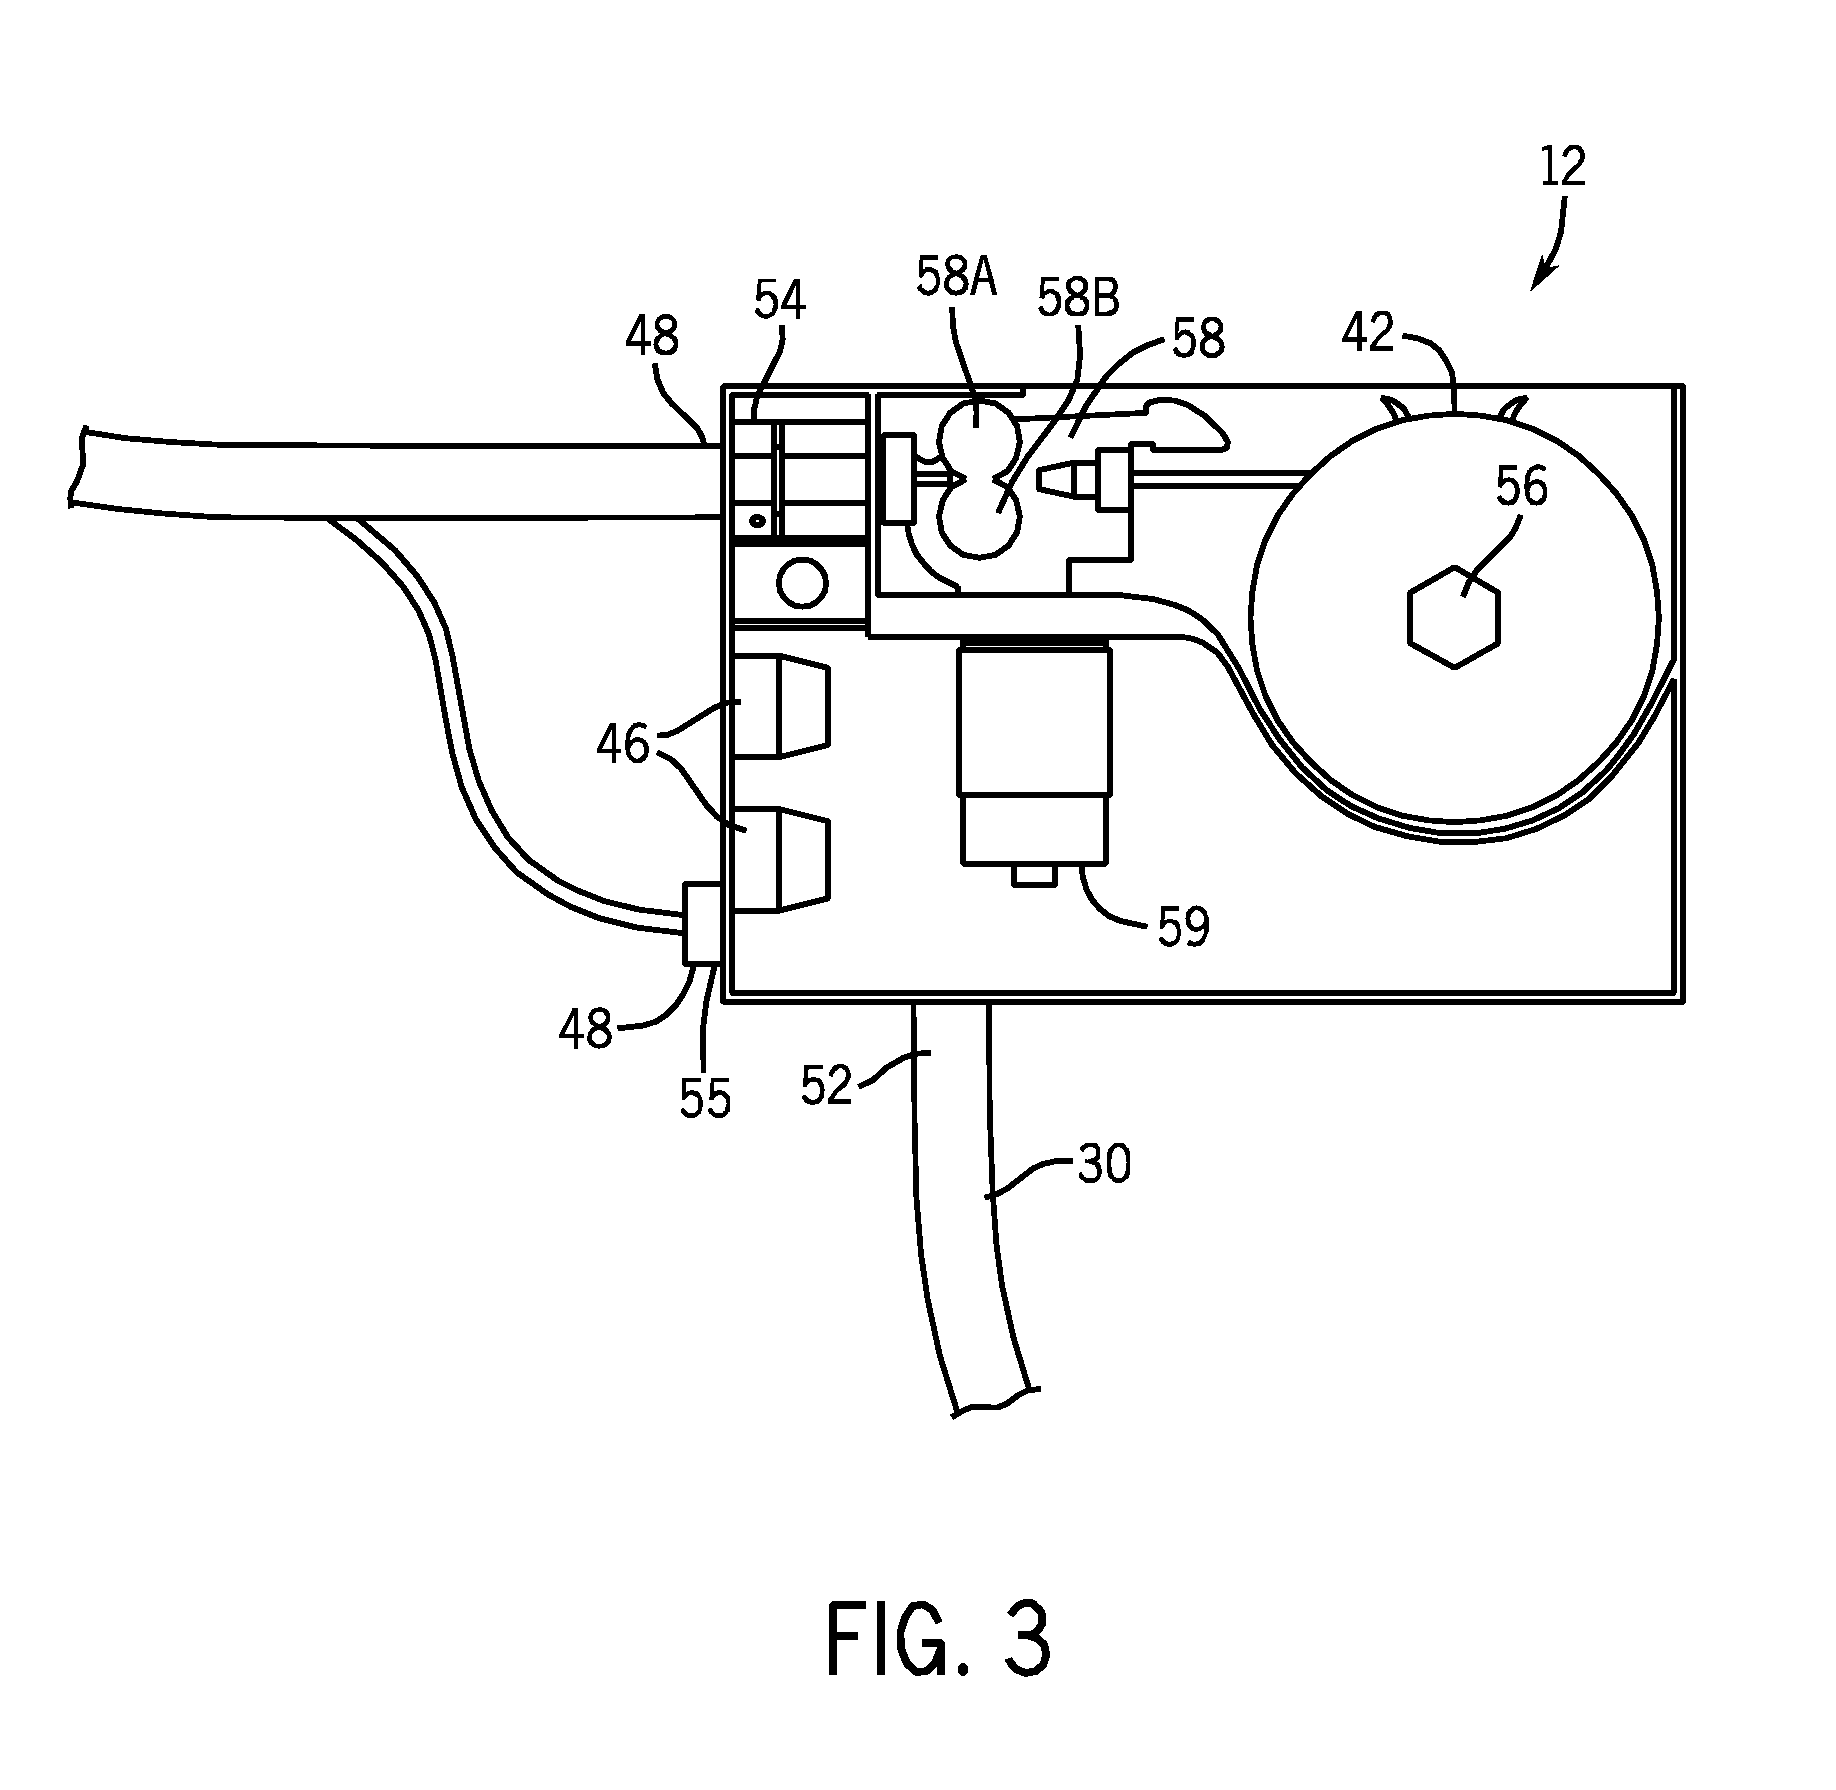 miller 30a spool wiring diagram miller spoolmatic parts